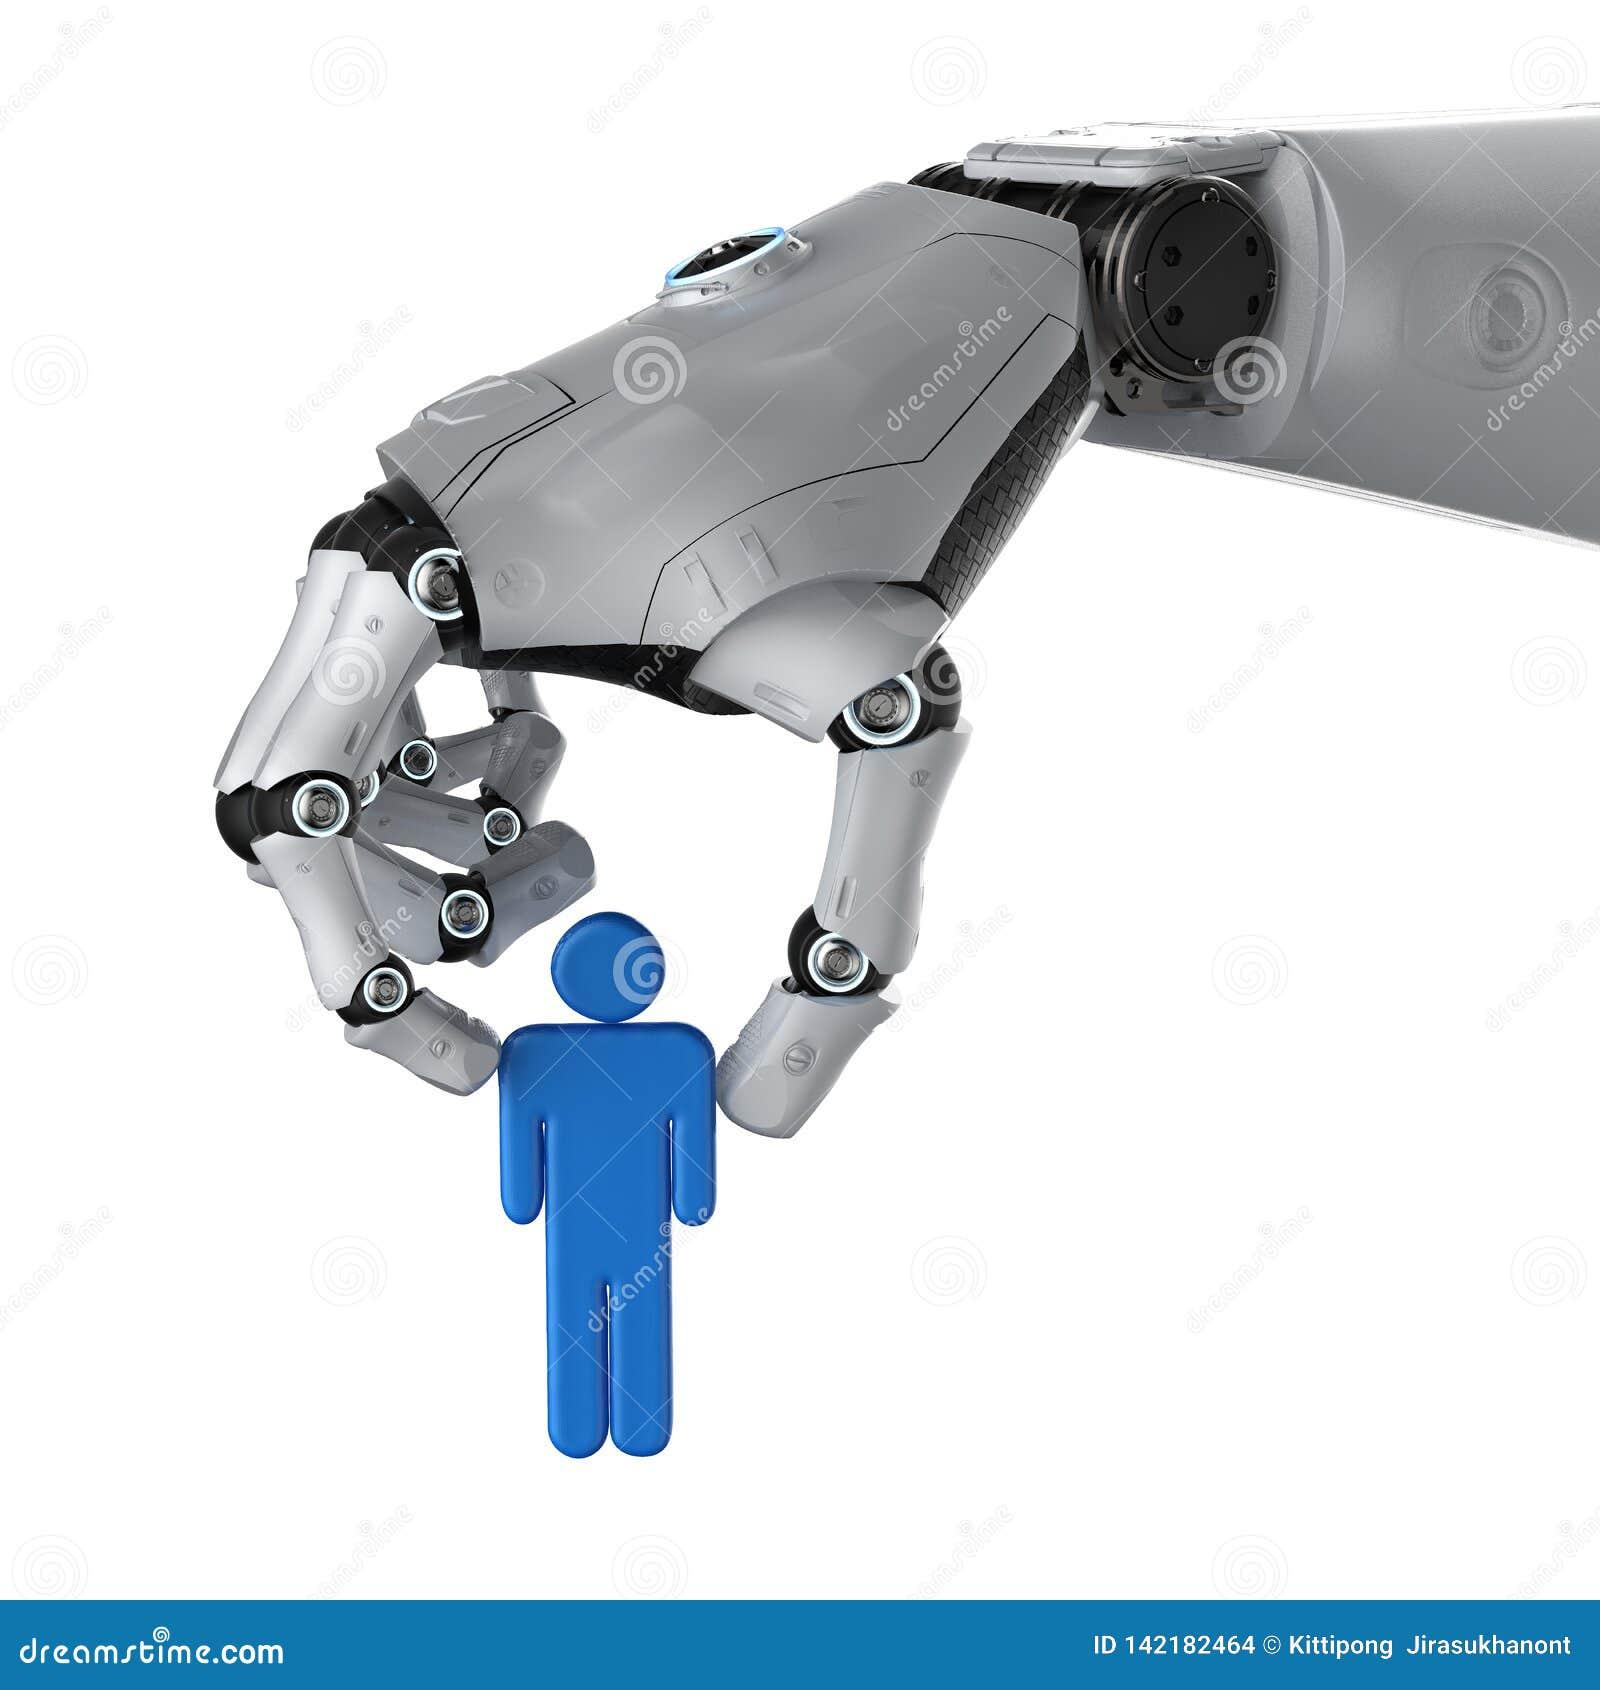 Artificial intellegence manipulation concept